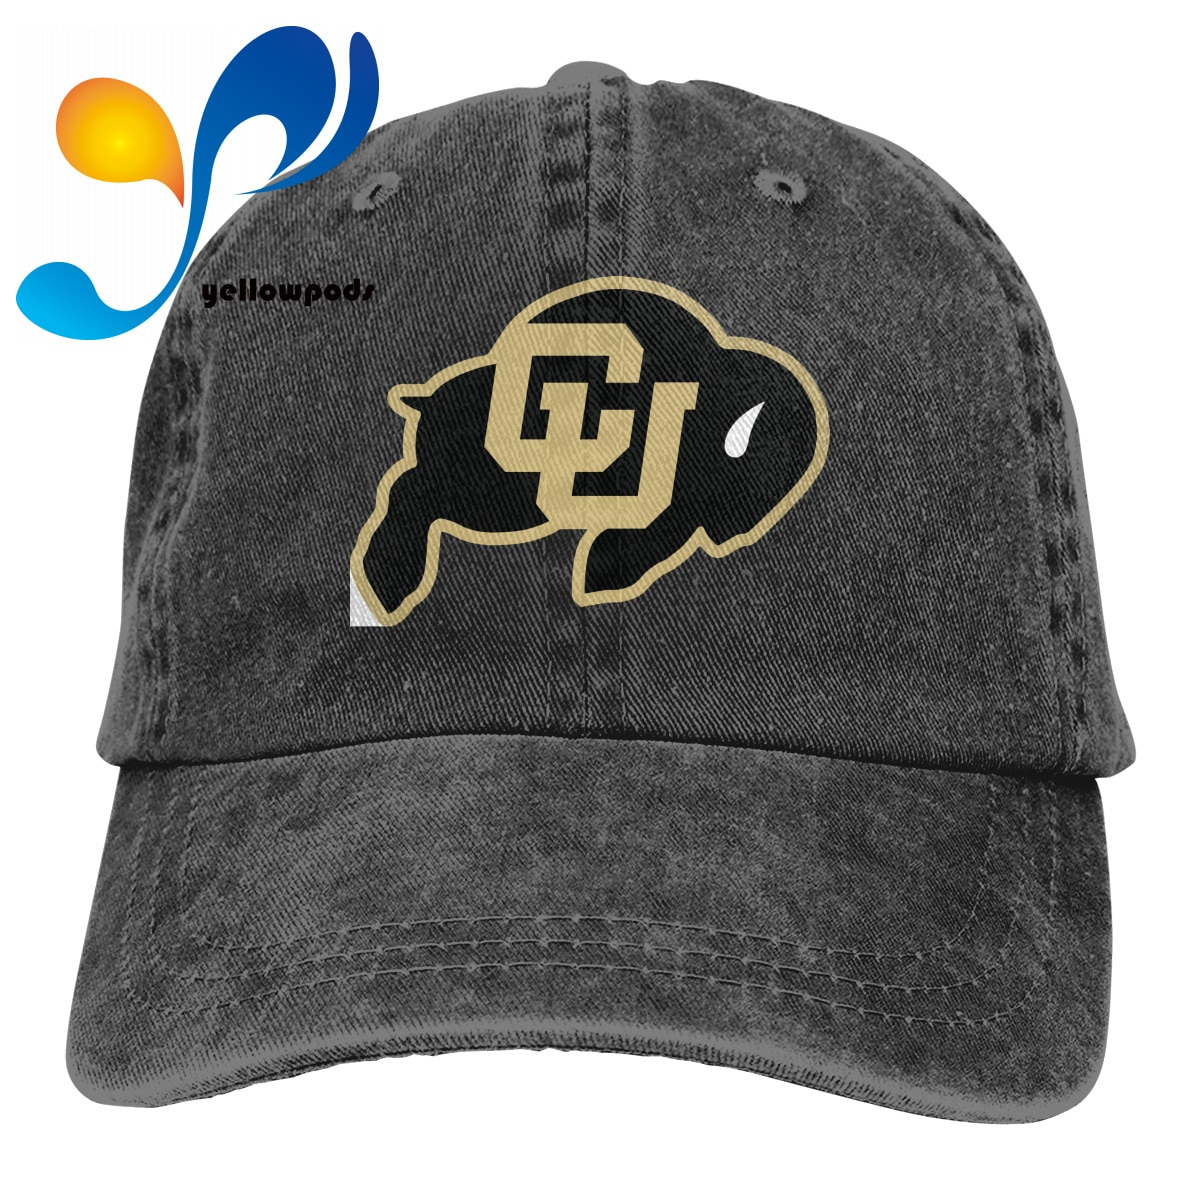 Sombrero de papá de ola lavada, gorra de Hip Hop Colorado Gorra de béisbol de algodón, gorra Snapback, gorra DEPORTIVA UNIVERSITARIA